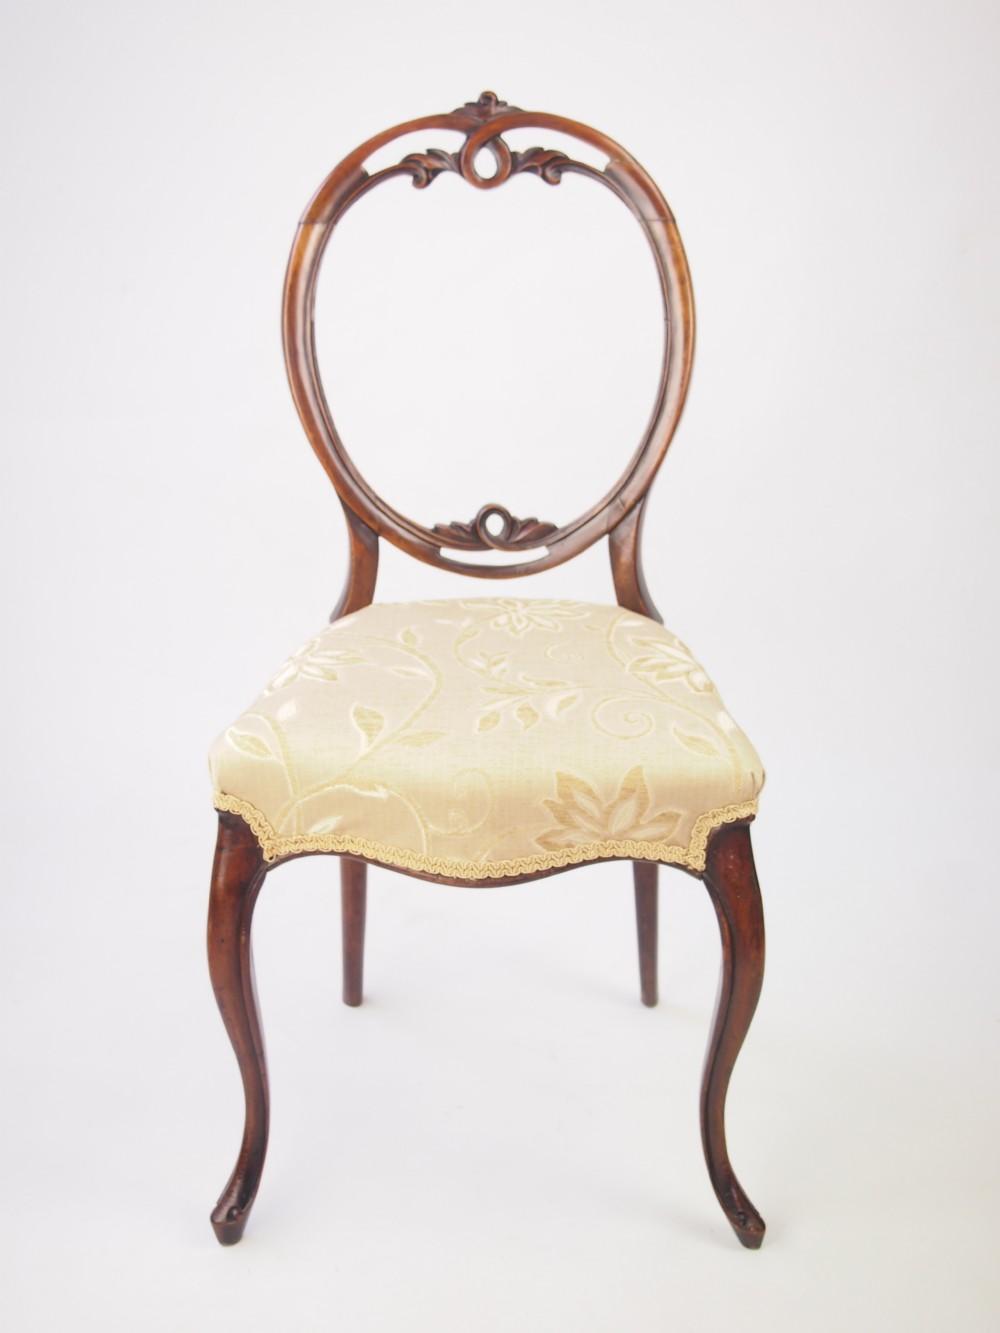 Antique Victorian Walnut Balloon Back Chair 278118